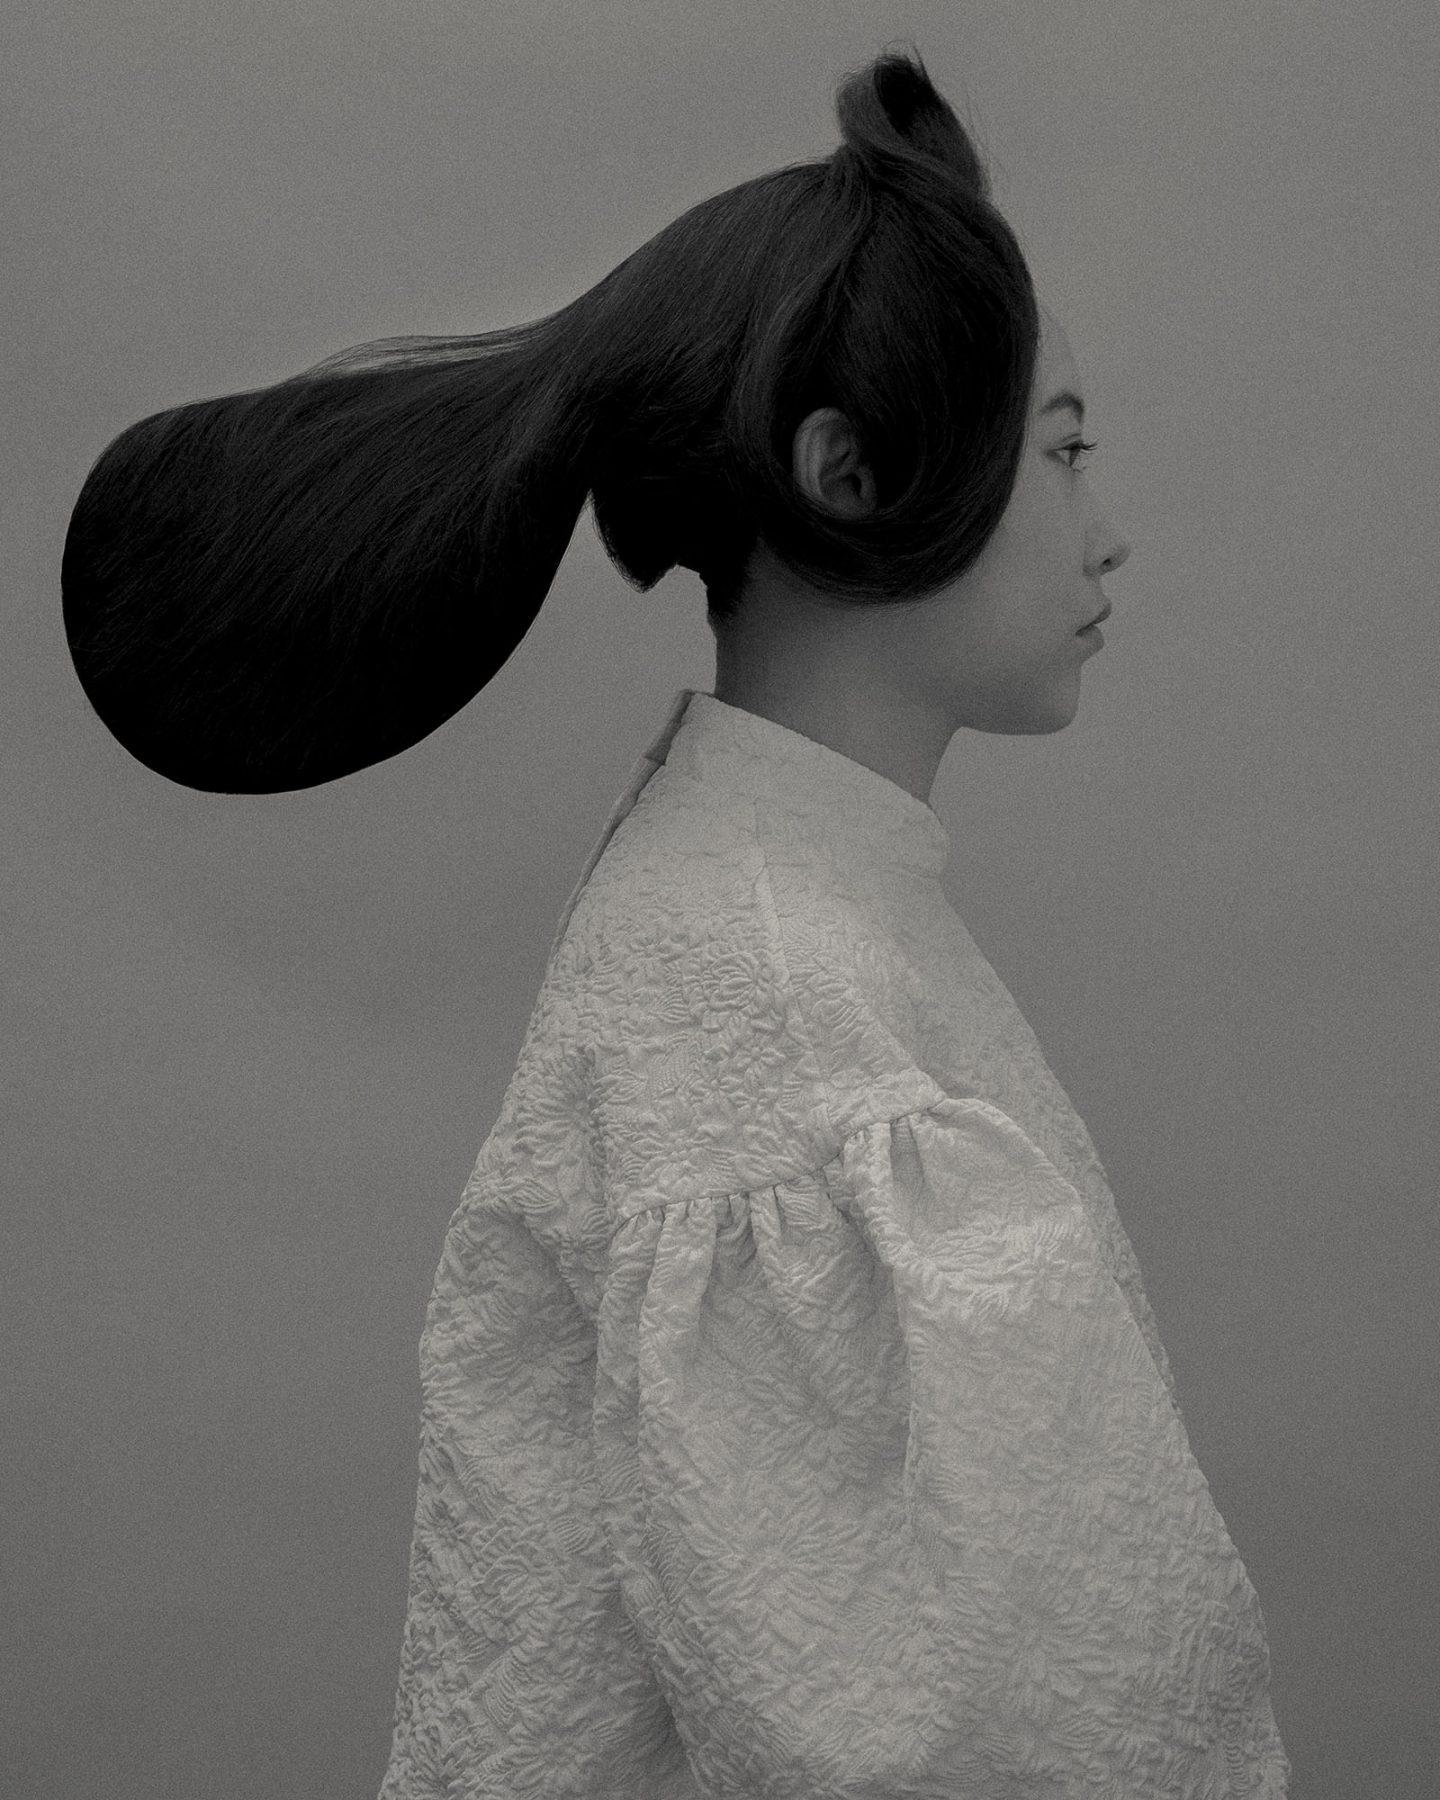 IGNANT-Photography-Paul-Phung-Toufa-Hair-06